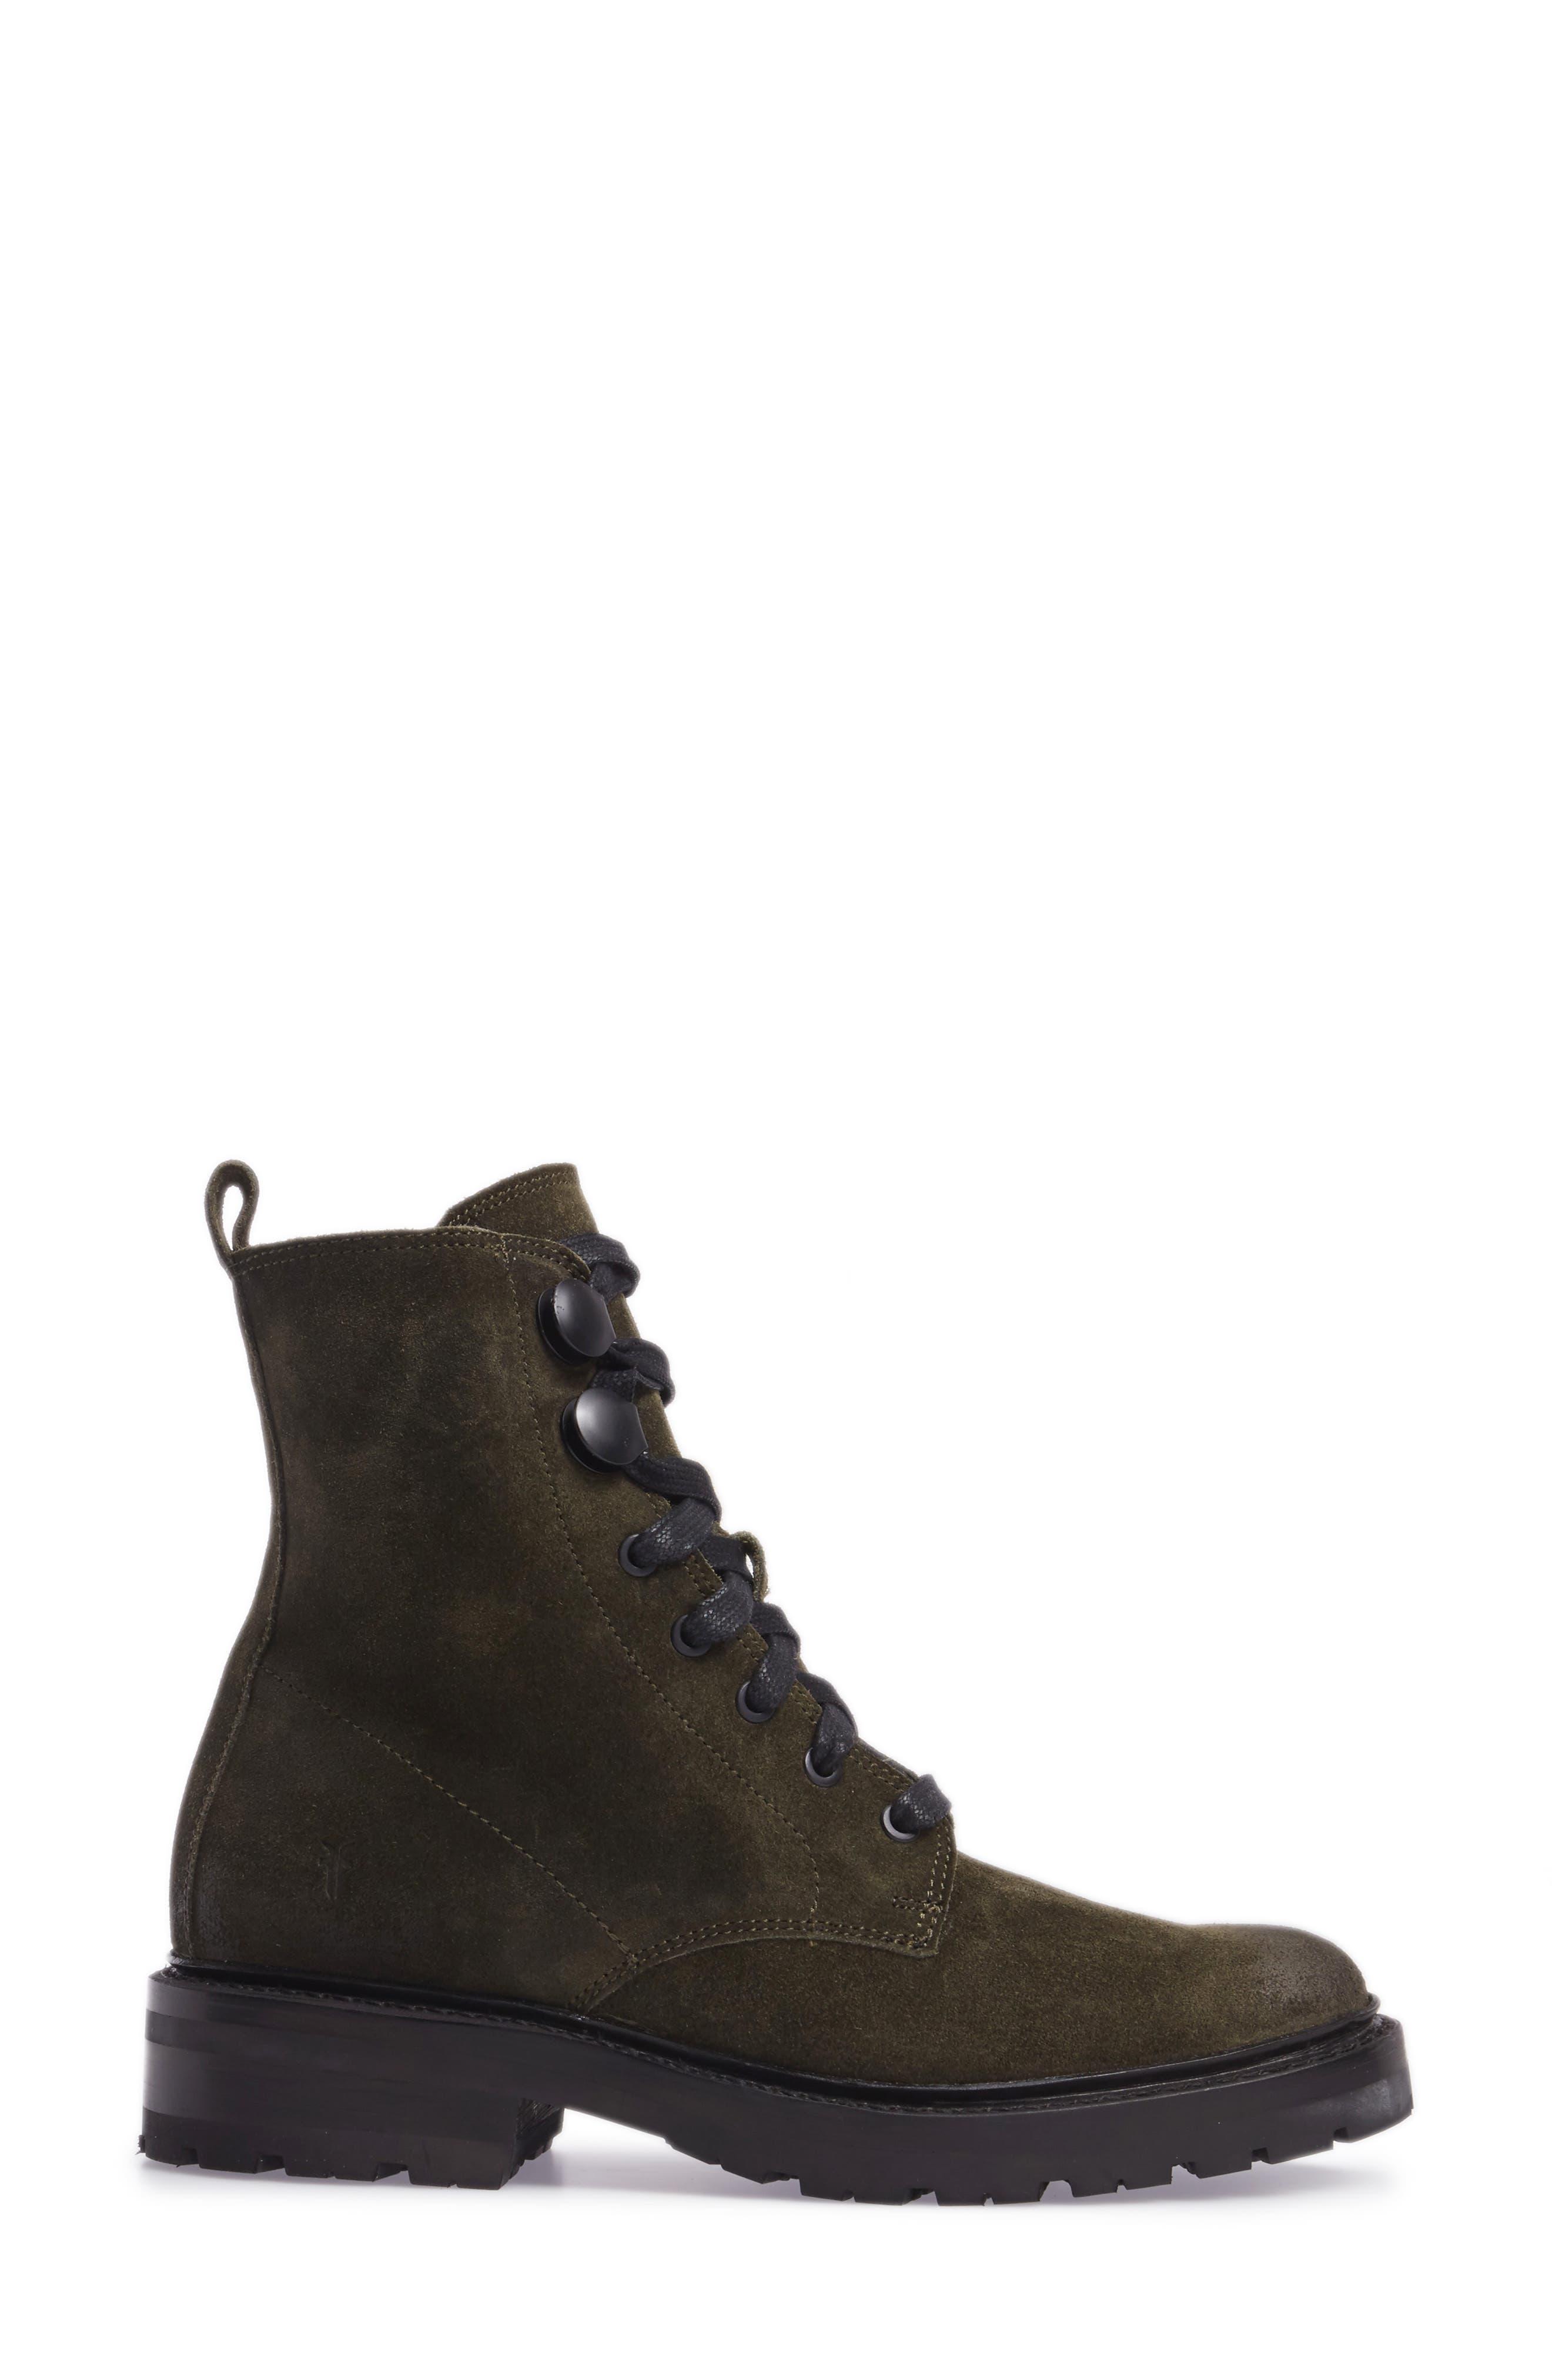 Julie Hook Combat Boot,                             Alternate thumbnail 3, color,                             Forest